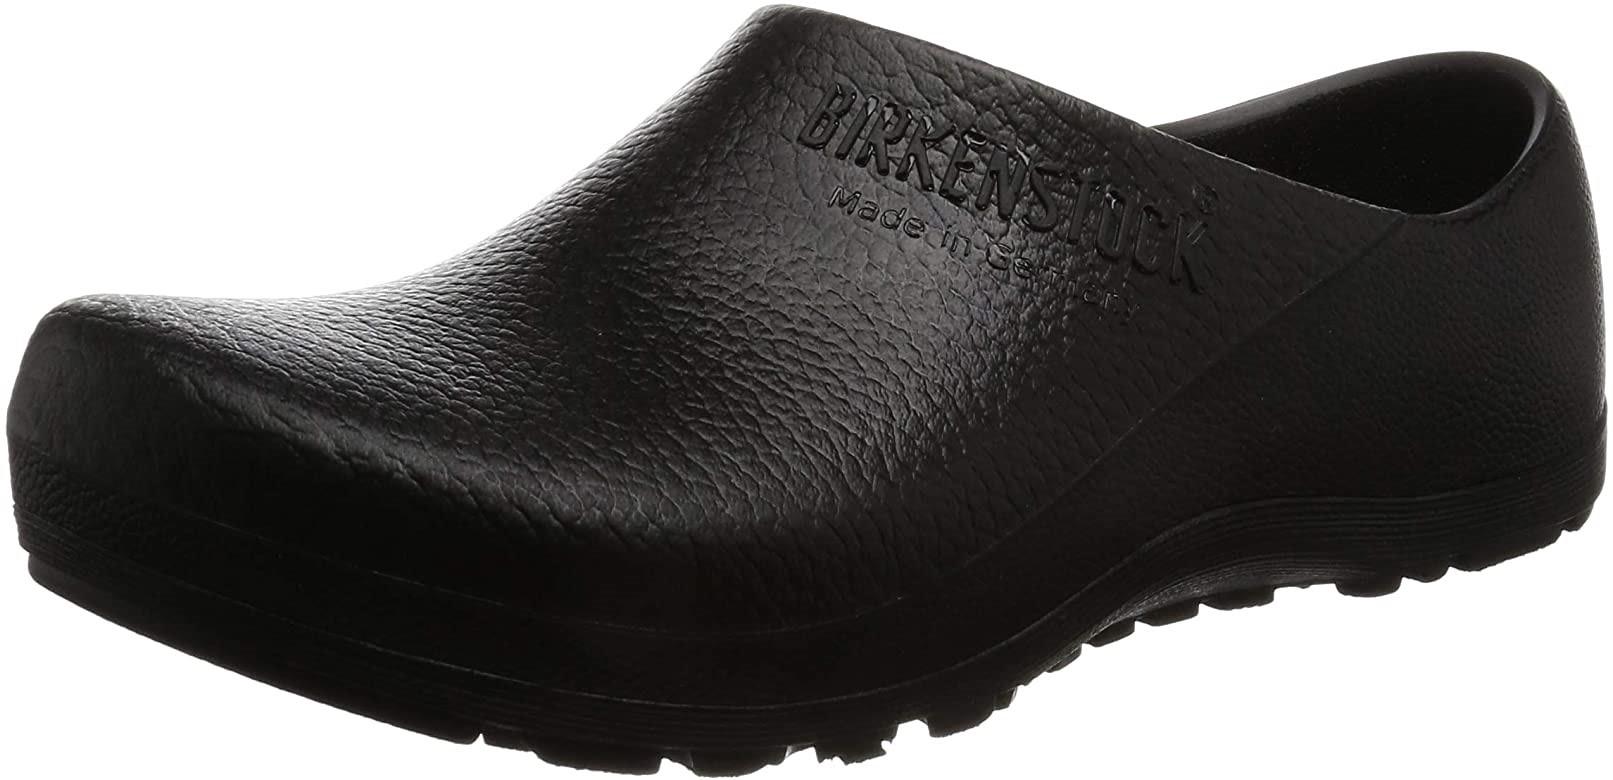 1. Professional Unisex Profi Birki Best Chef Shoes